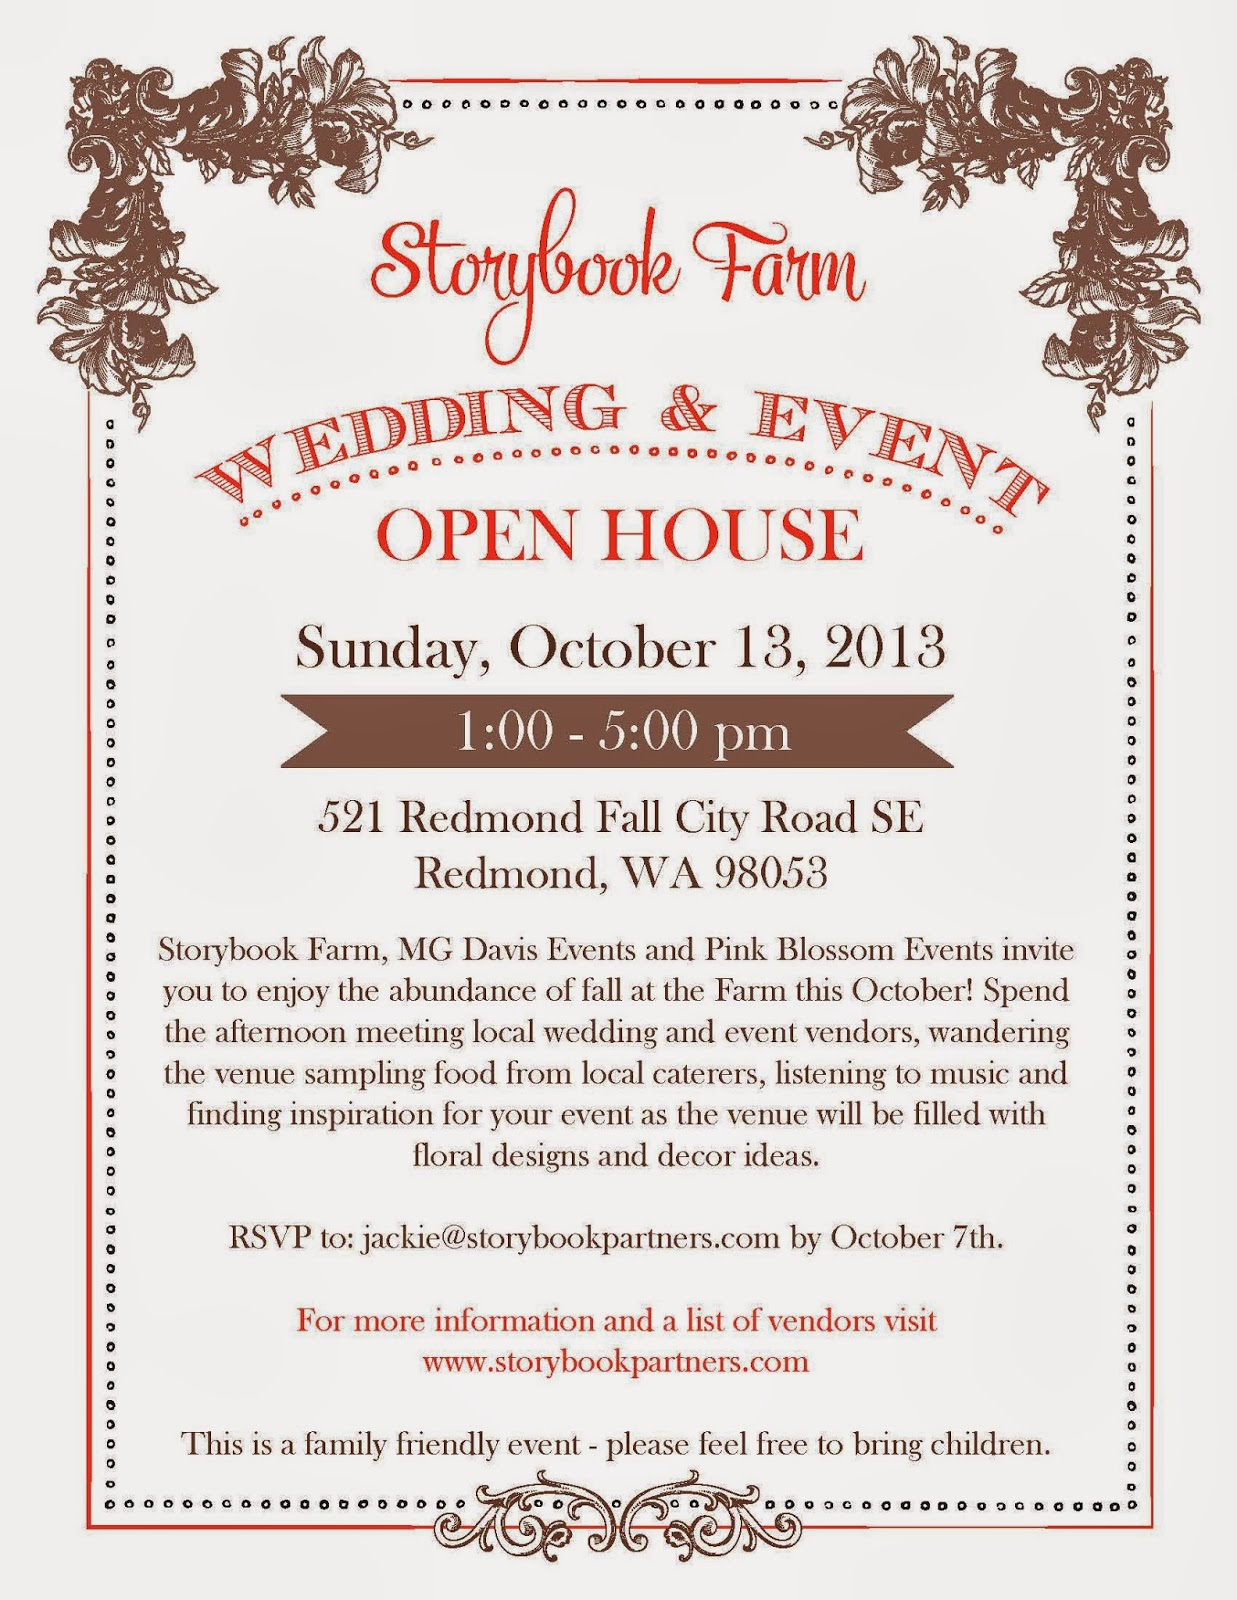 Storybook Farm Wedding Event Open House